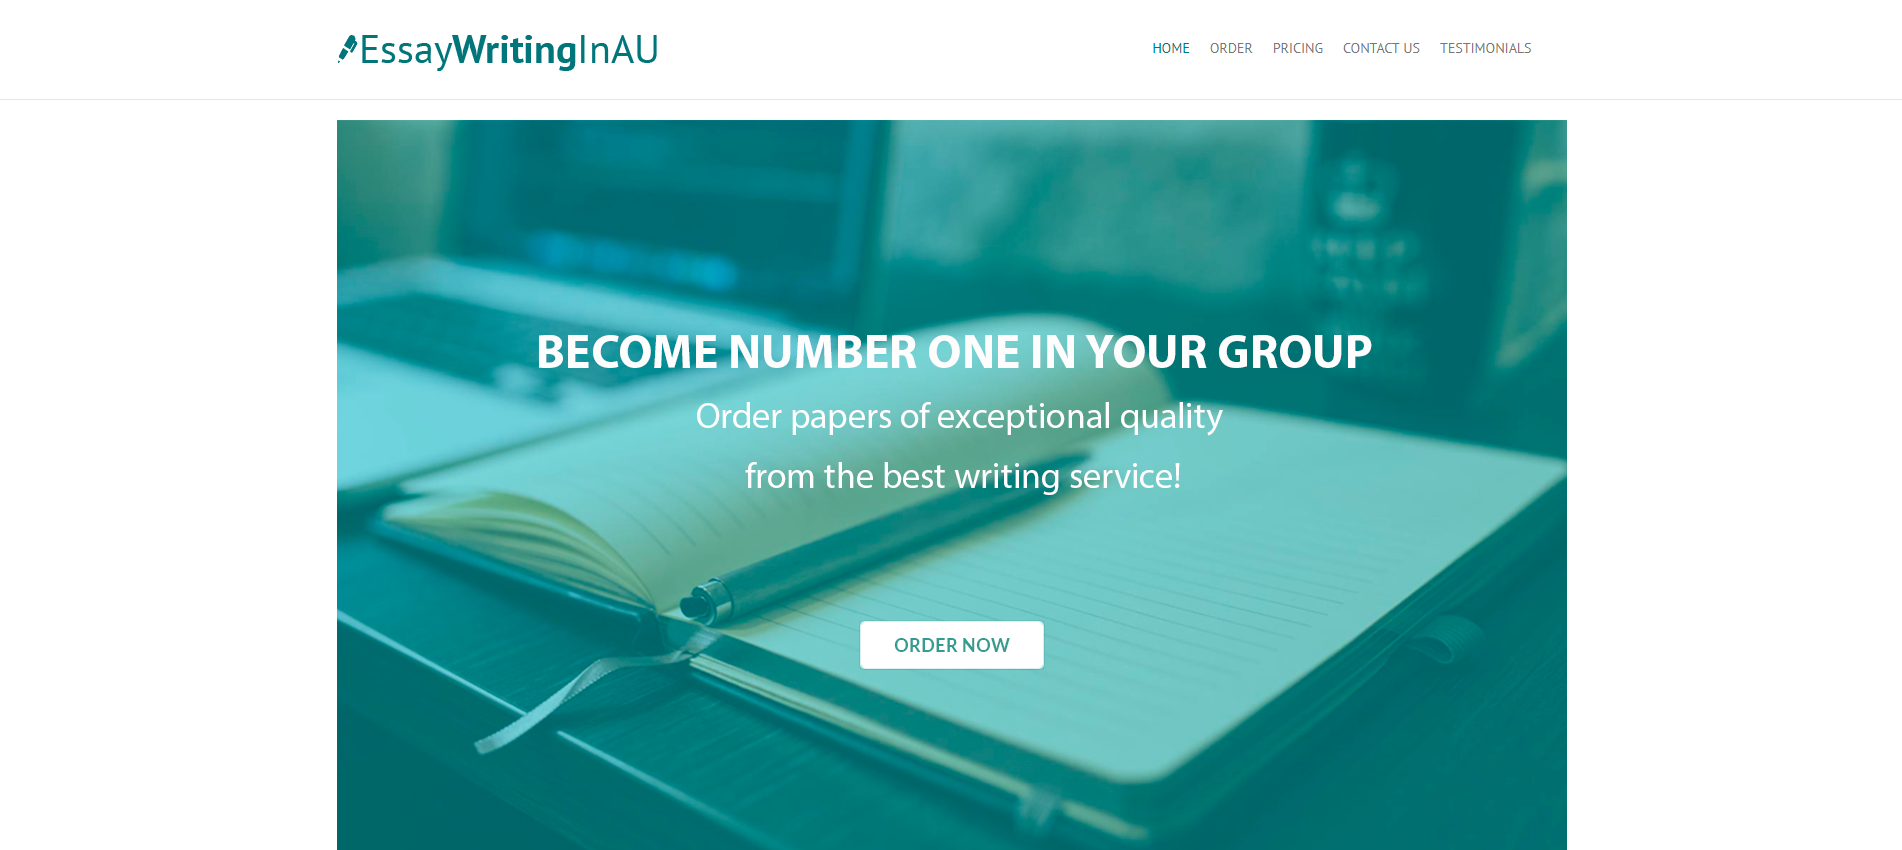 EssayWritingInAU. com &ndash the best service for Aus...